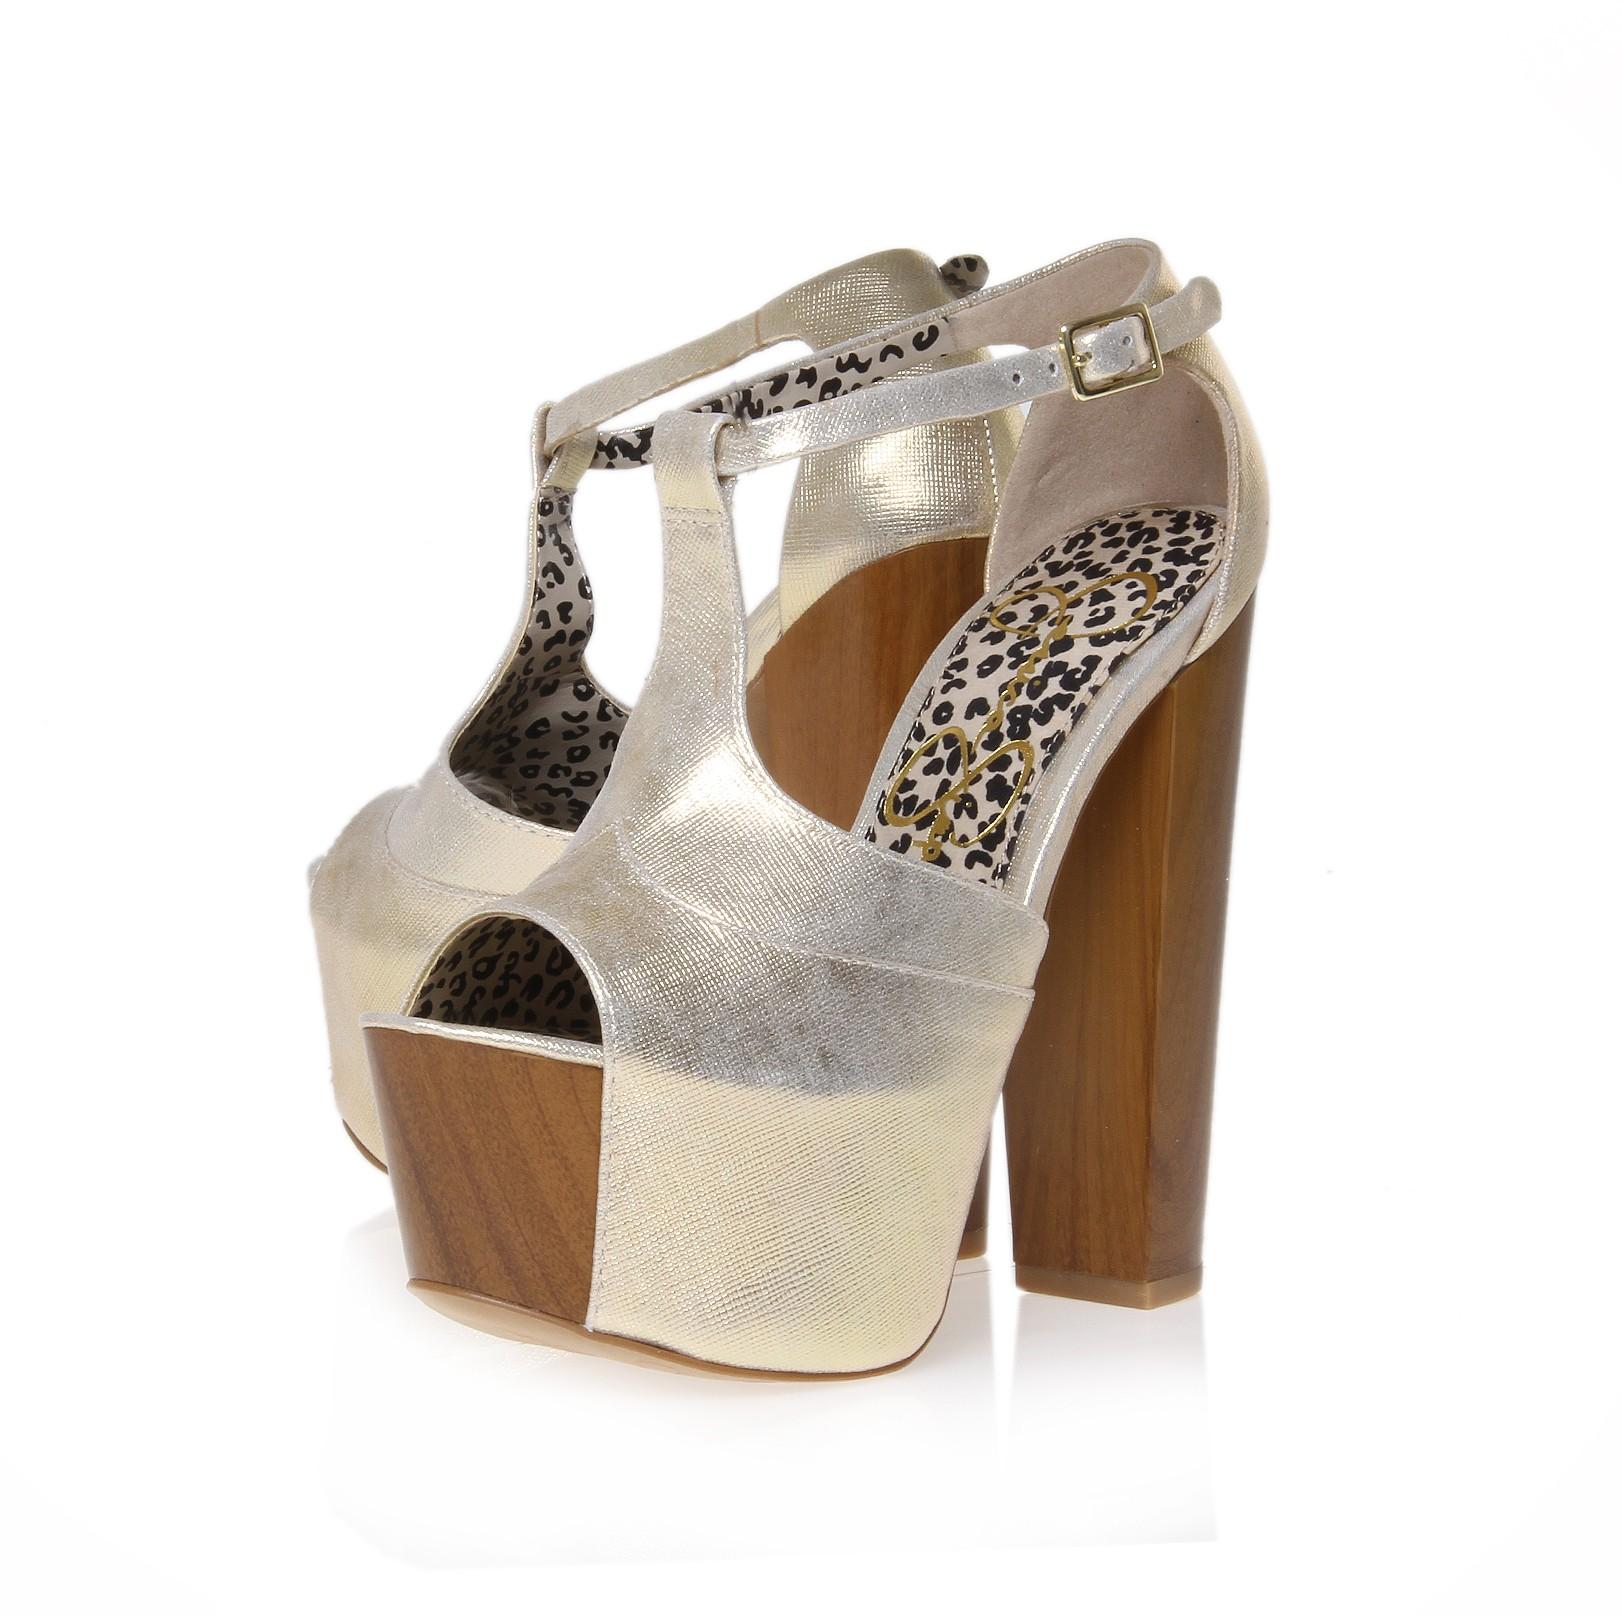 Jessica Simpson Dany Shoes Uk